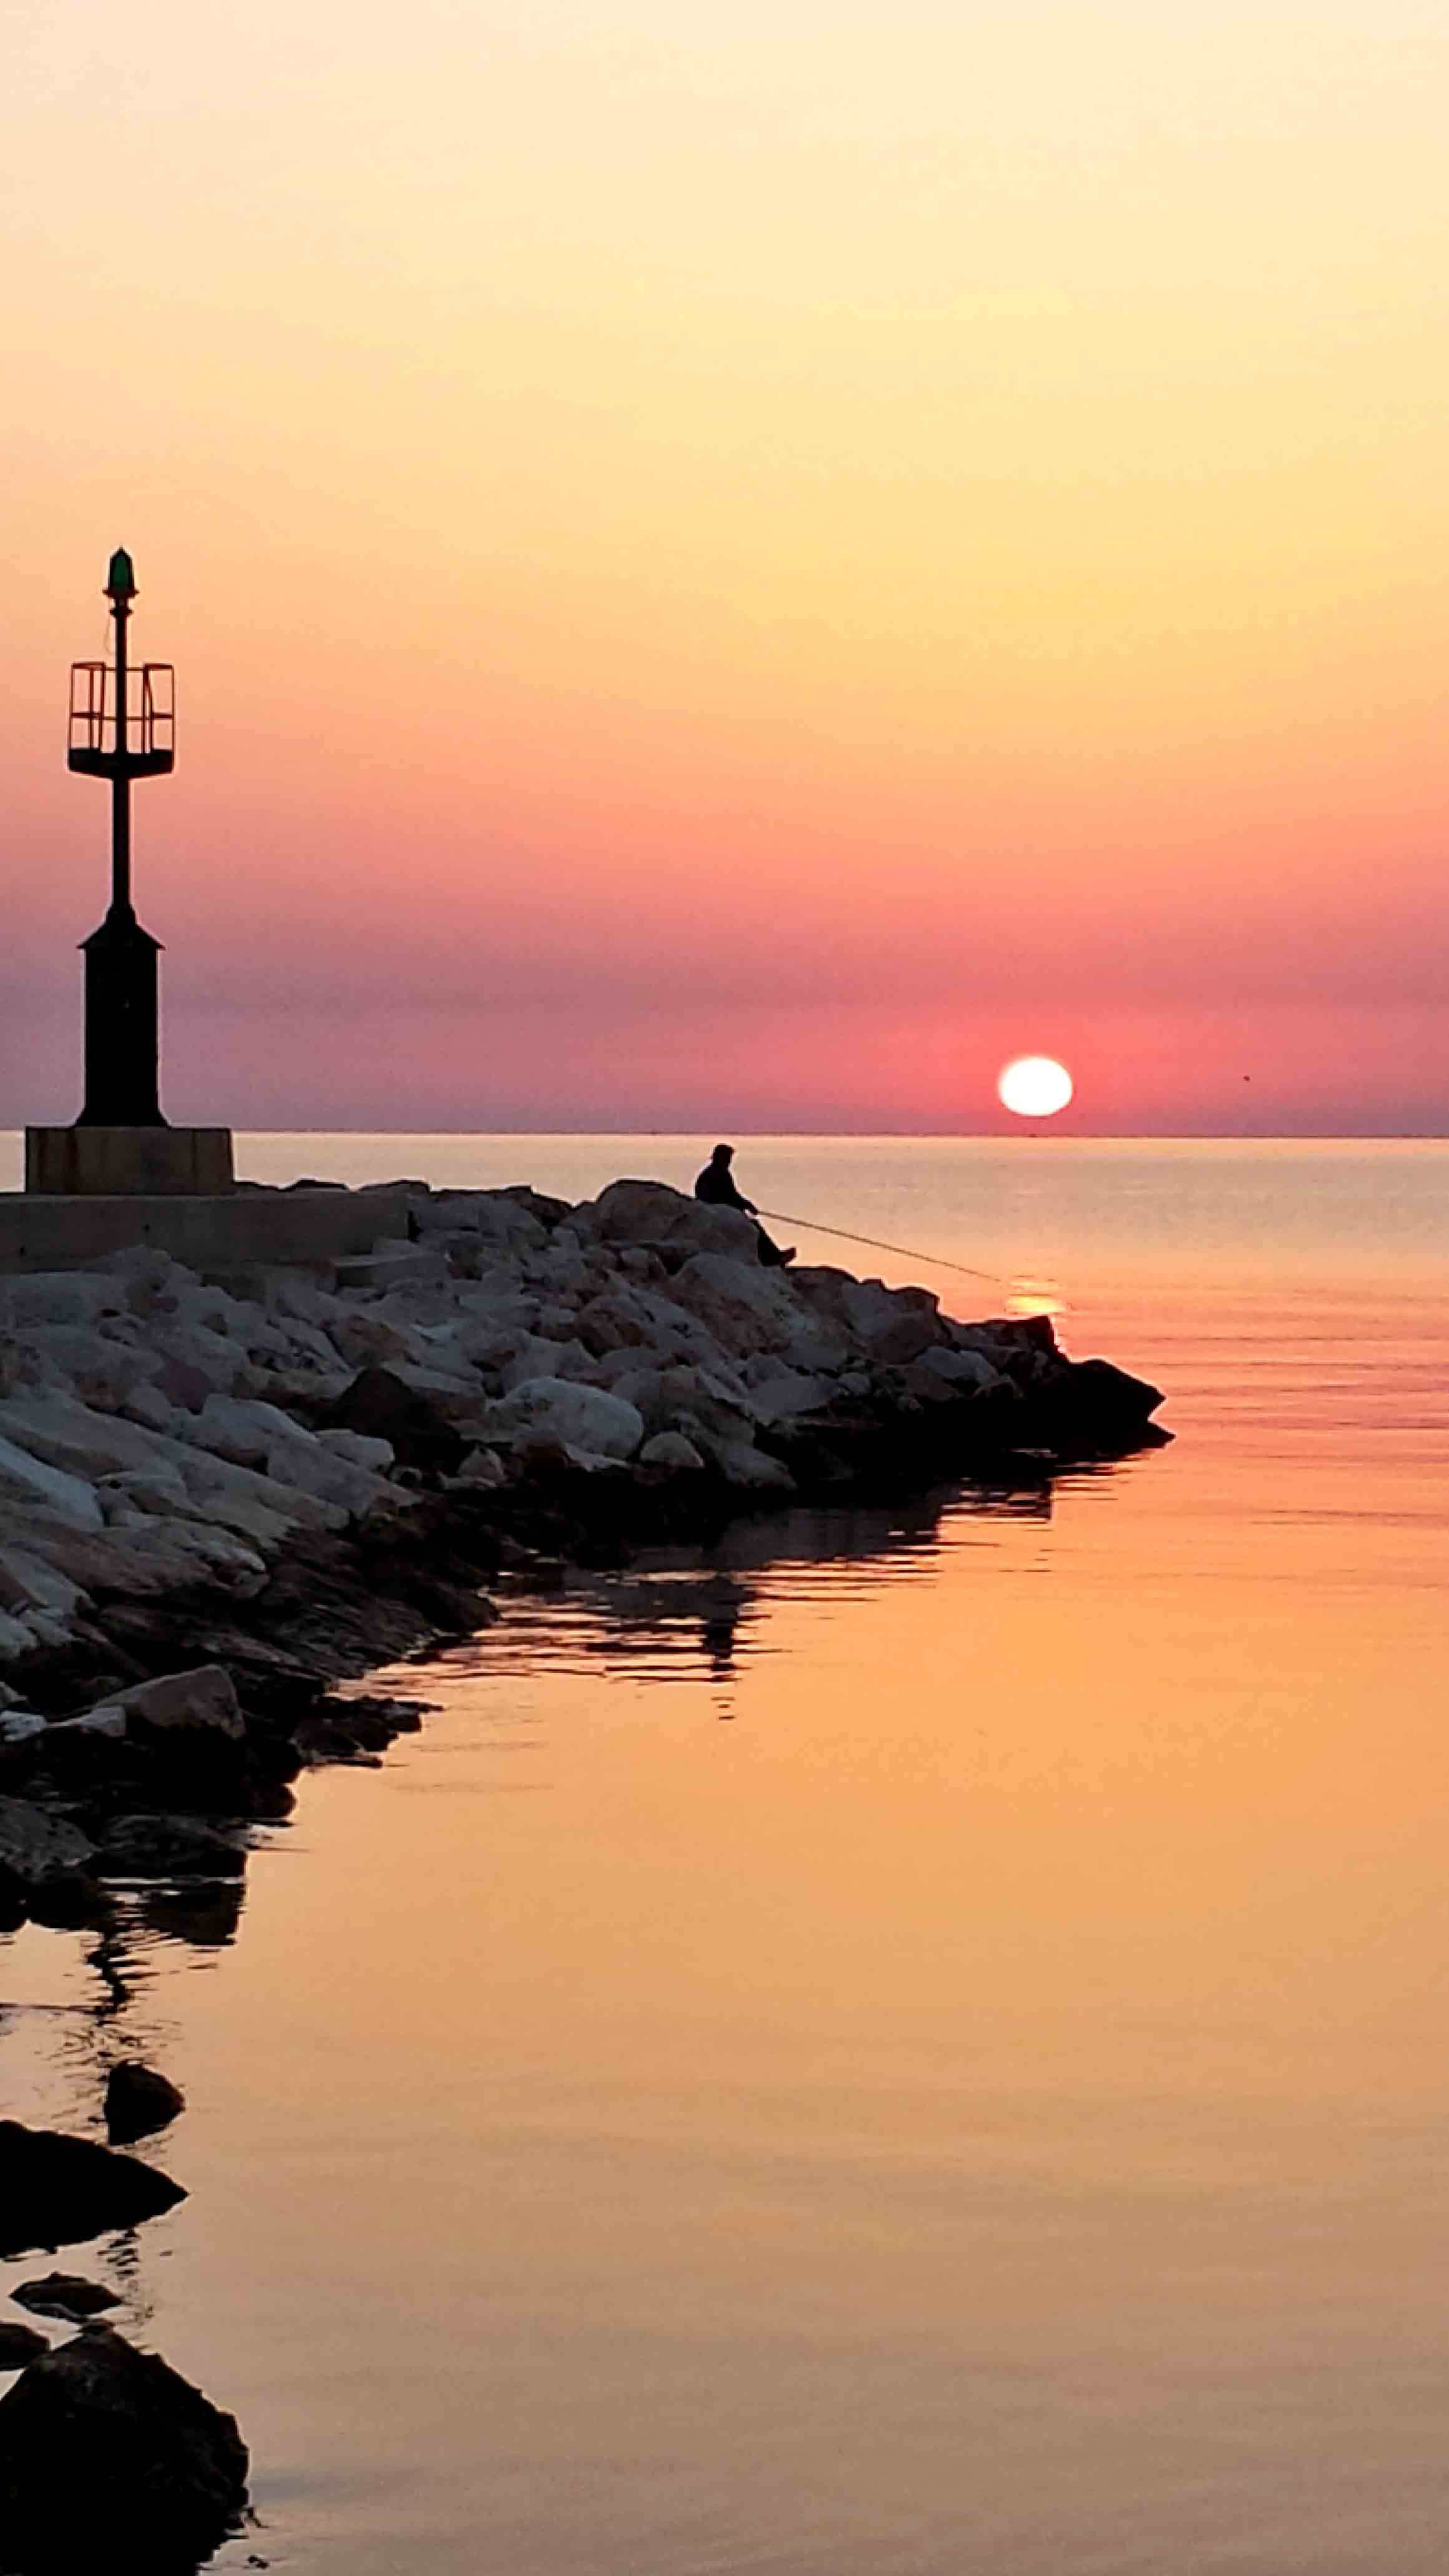 Pescatore in alba garganica